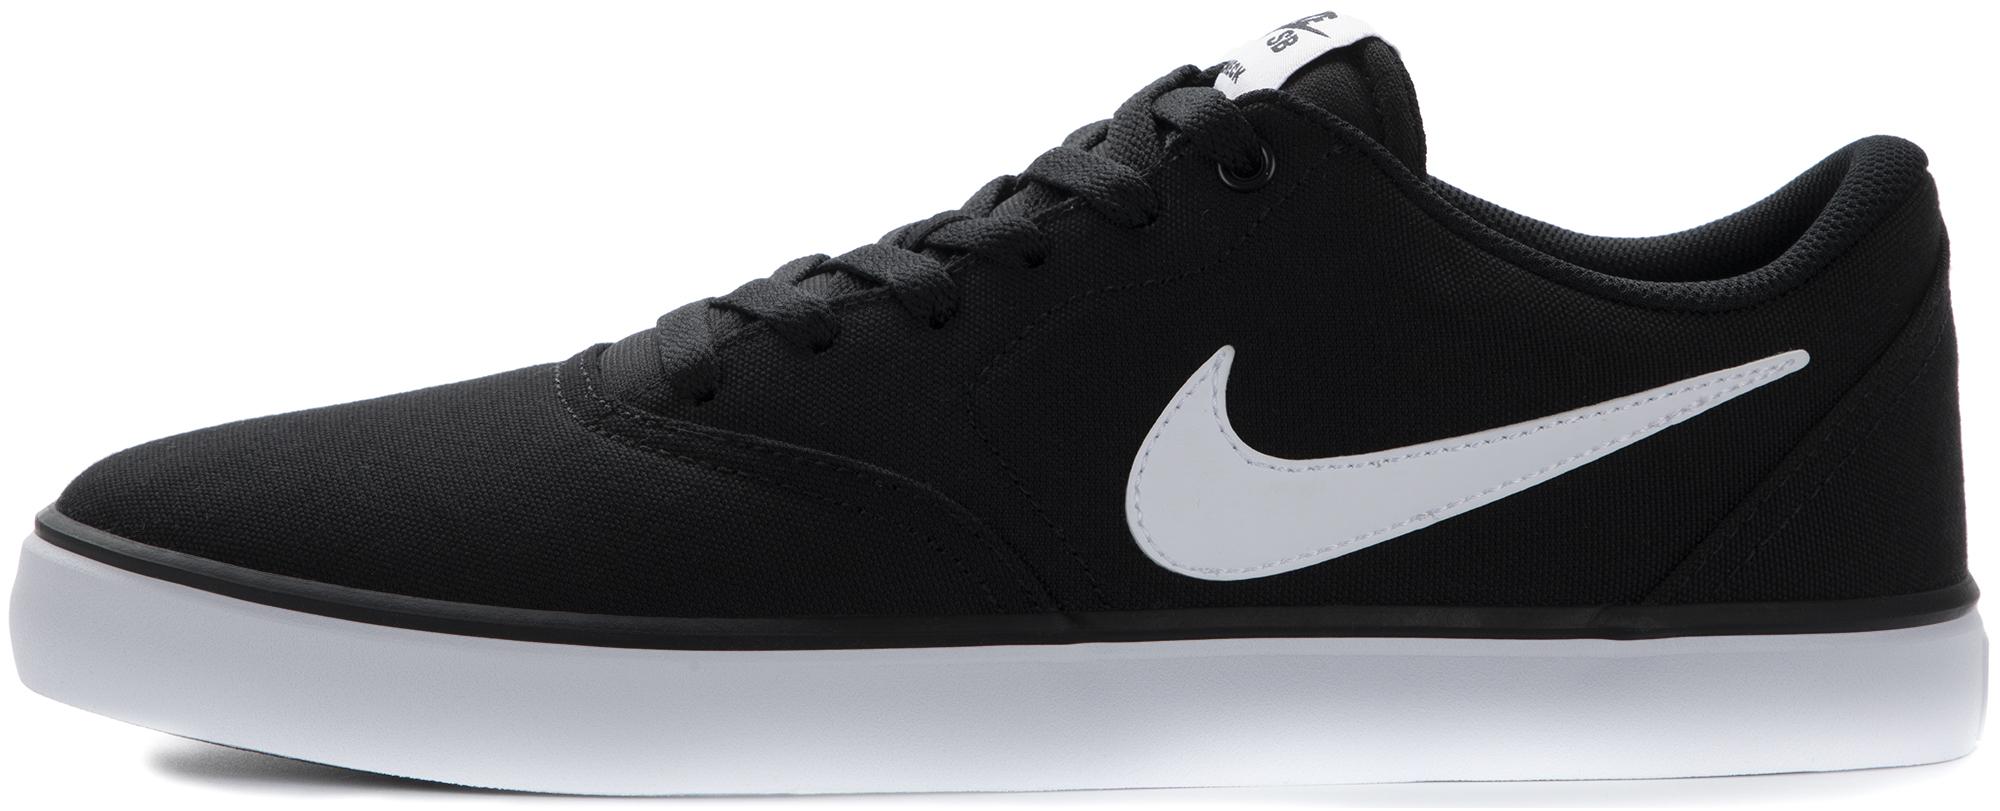 Nike Кеды мужские Nike Sb Check Solar Cnvs, размер 41,5